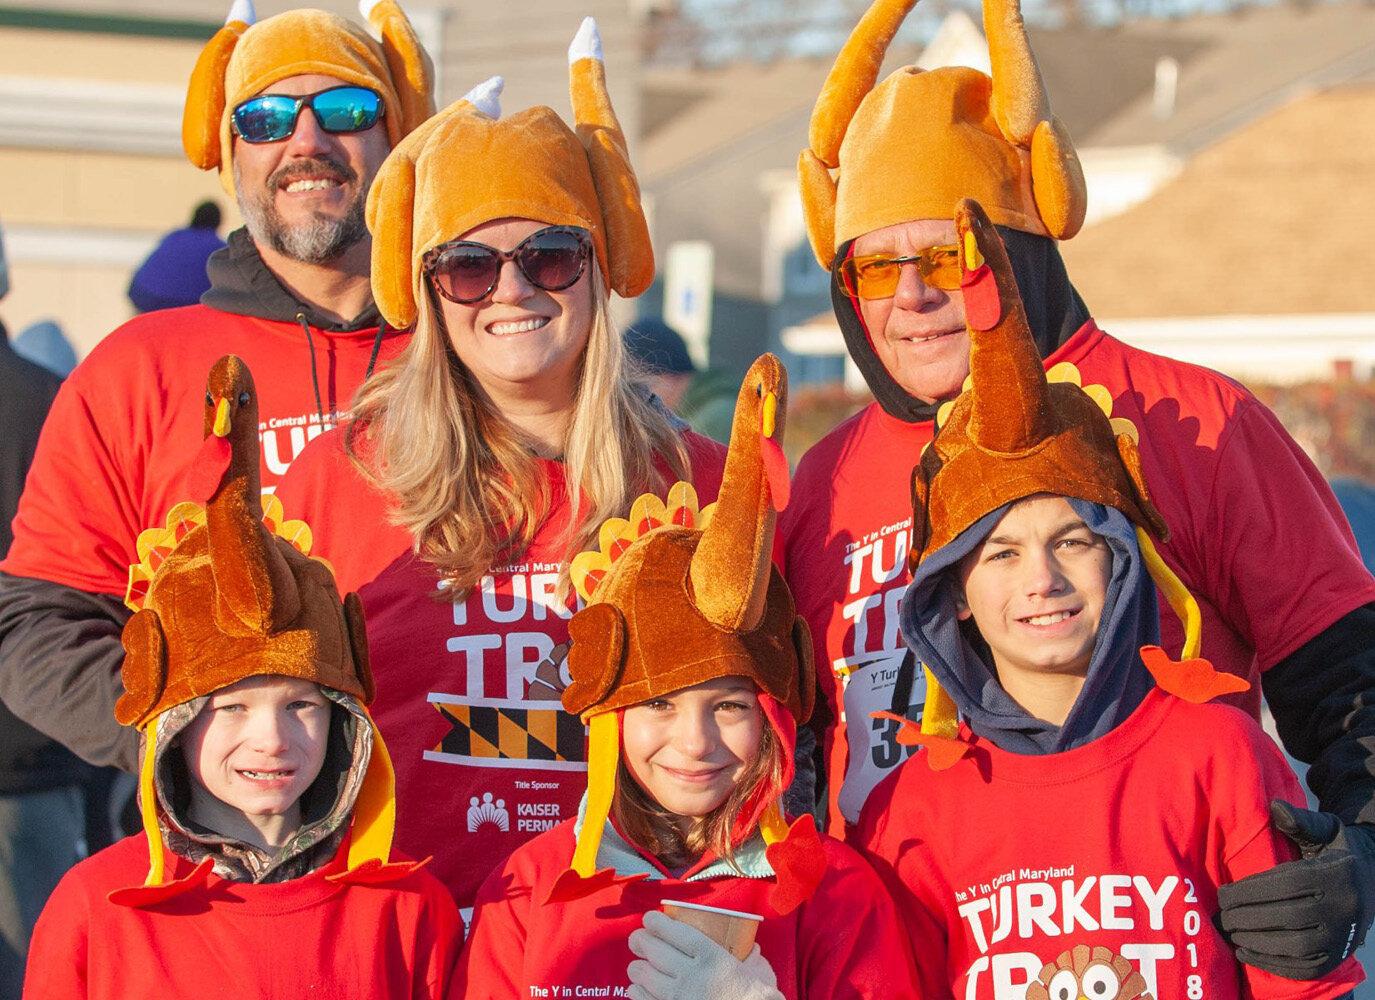 TurkeyTrotPhotoSelection_330x240PX8 (1).jpg